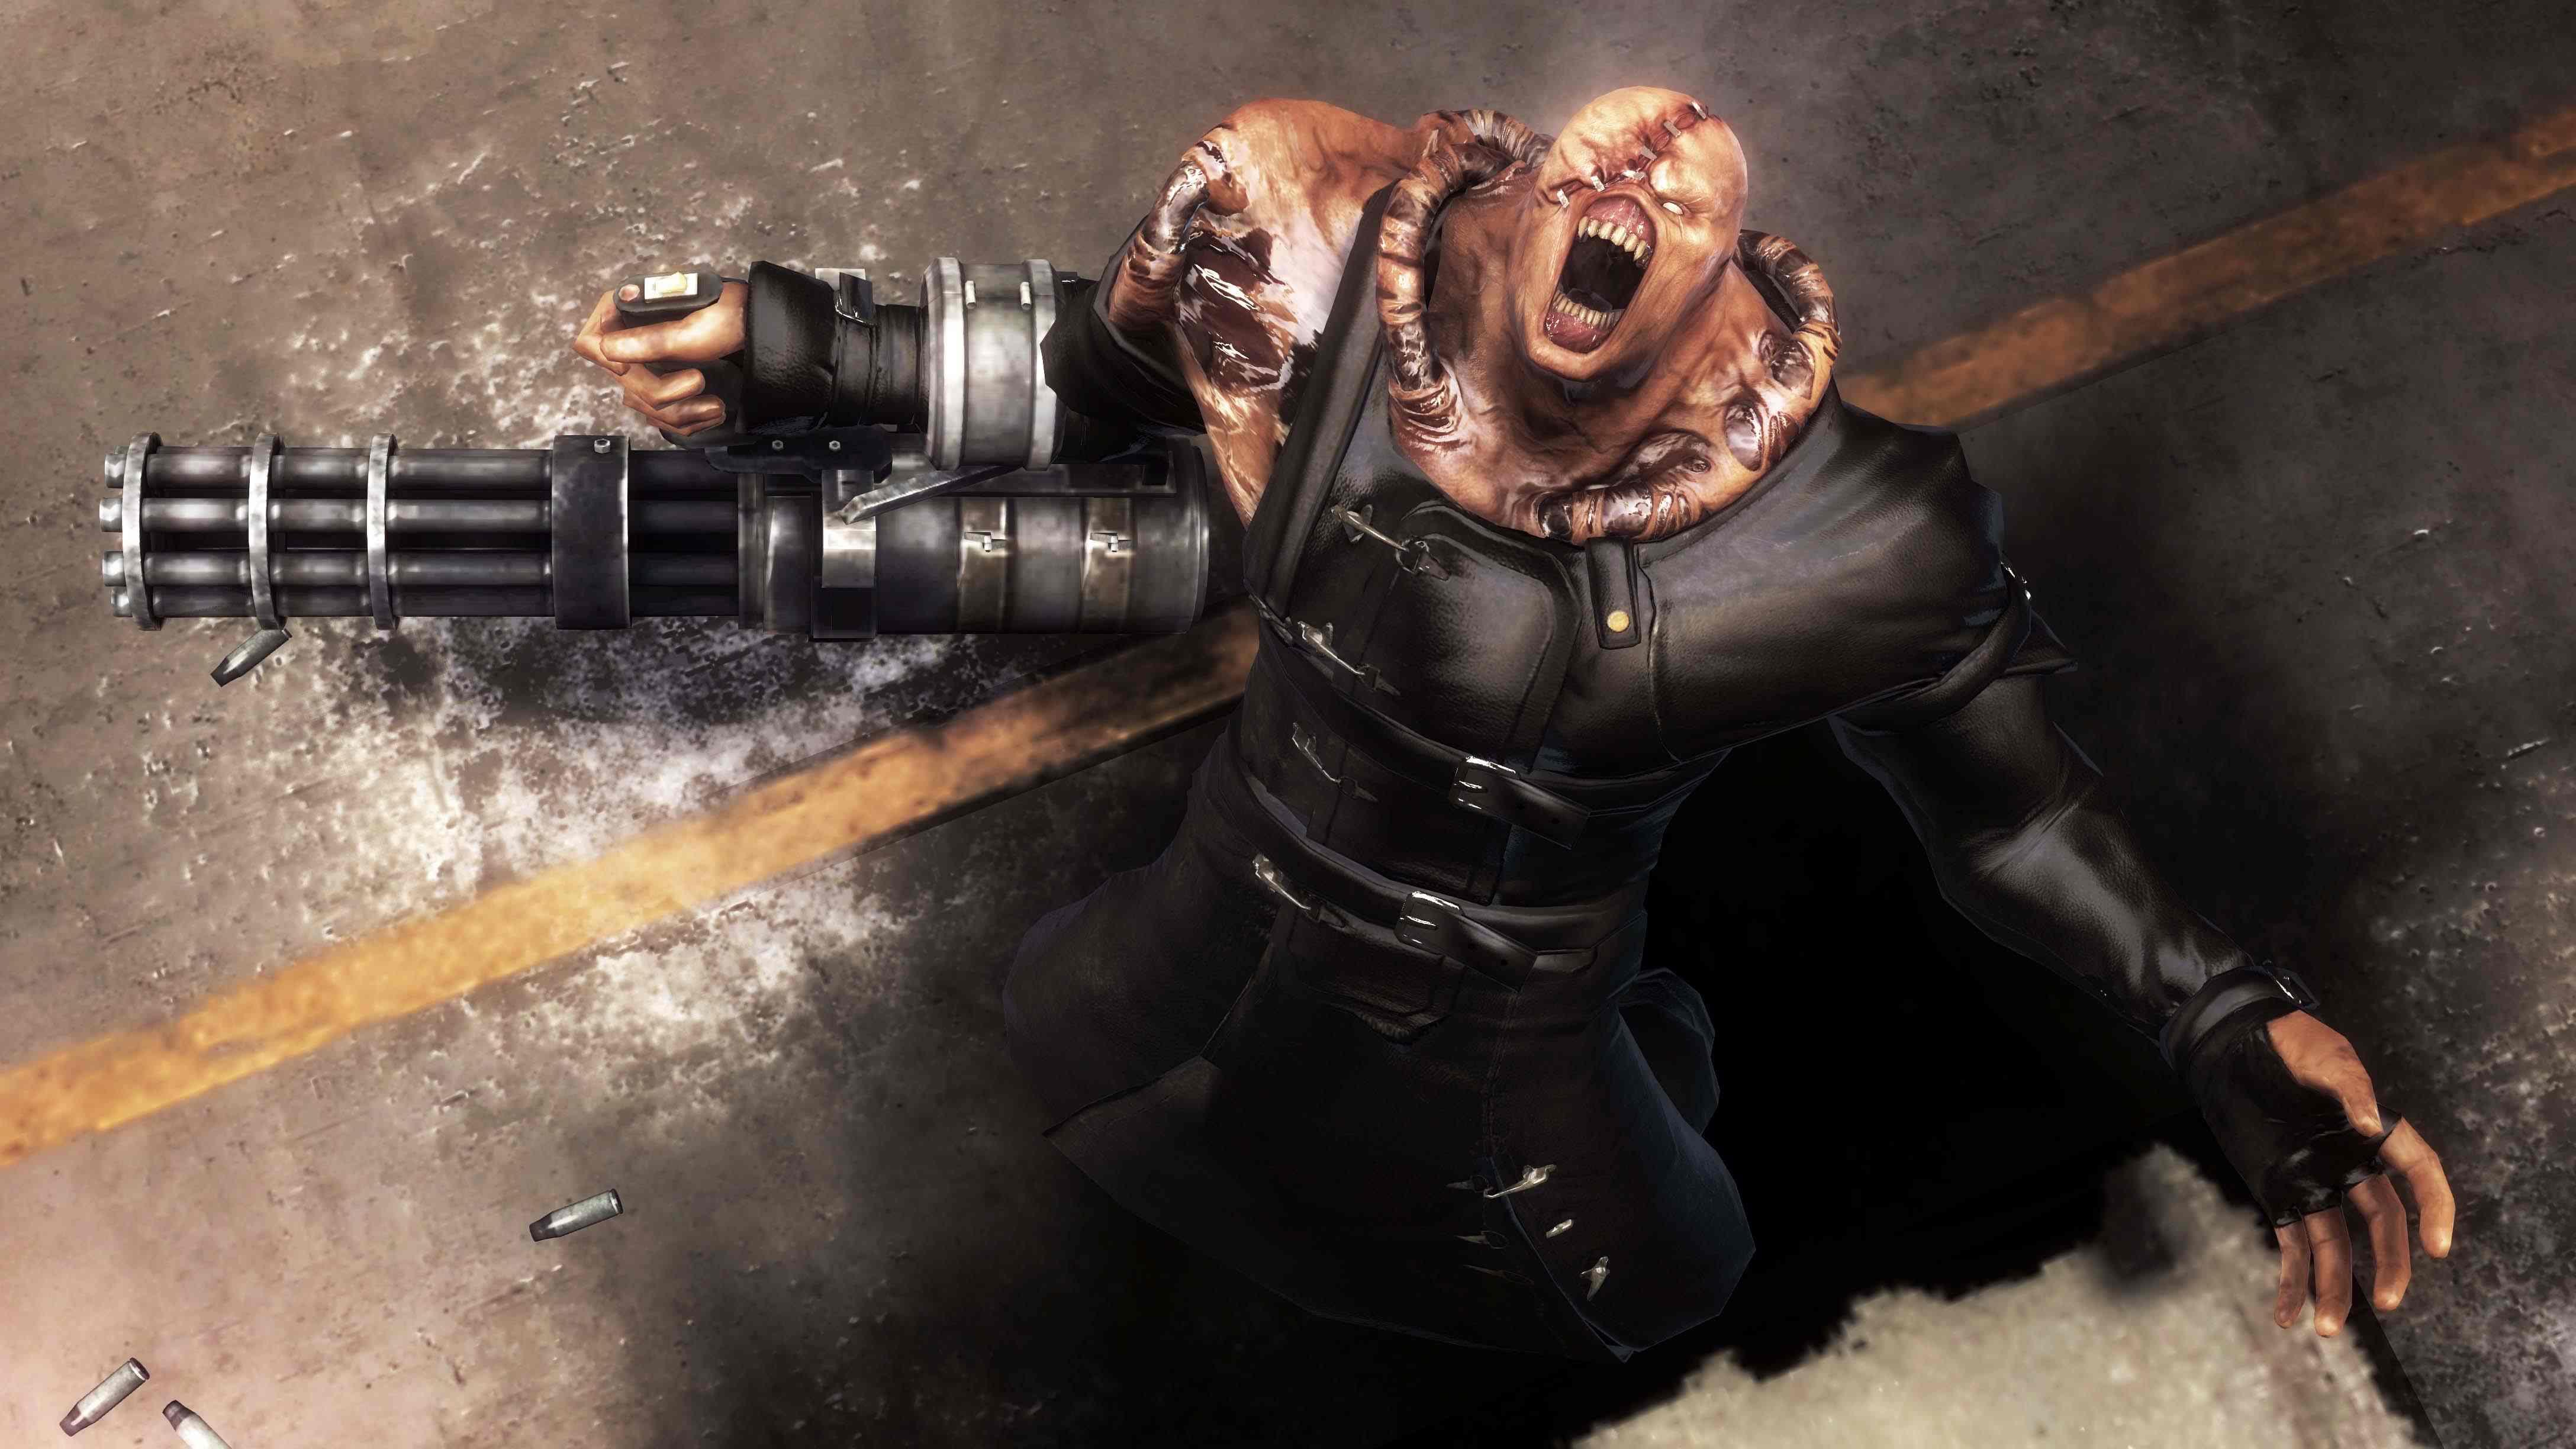 Resident-Evil-Operation-Raccoon-City-05-03-12-006